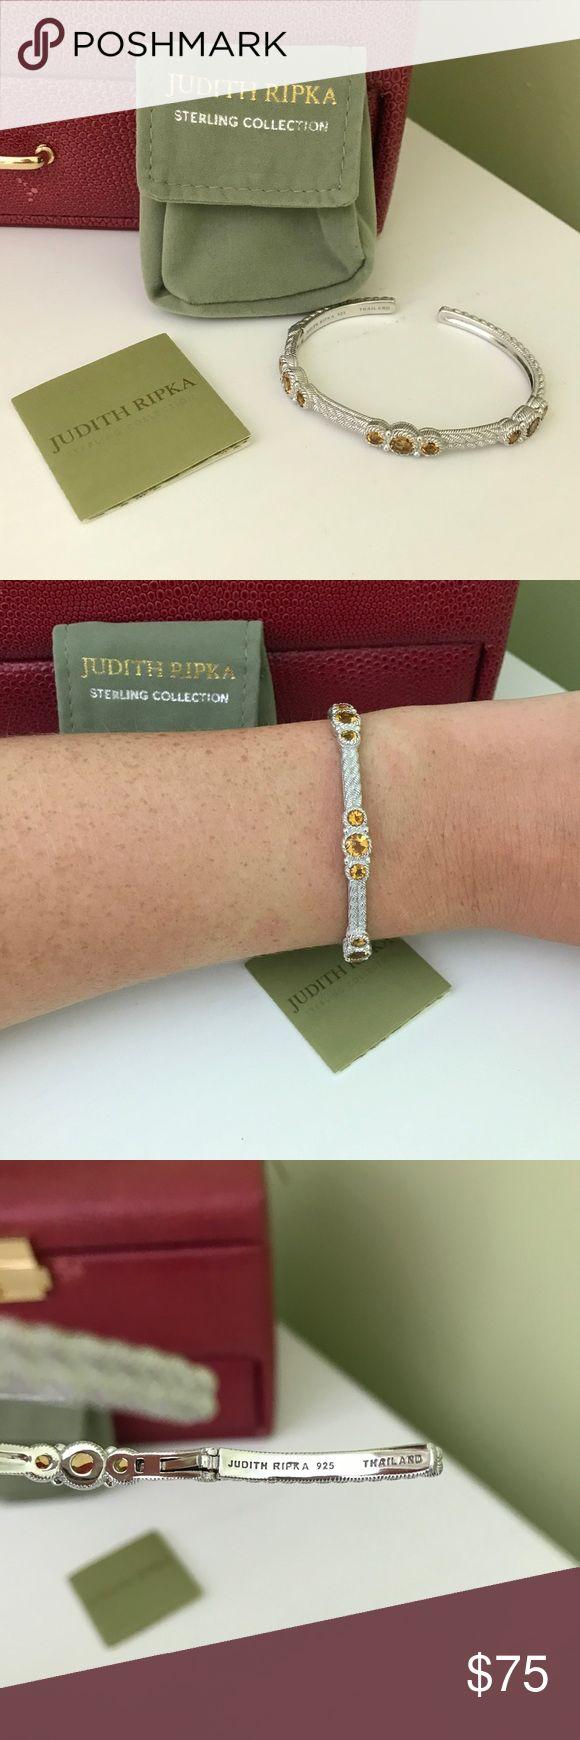 JUDITH RIPKA STERLING CITRINE HINGED CUFF BRACELET JUDITH RIPKA STERLING CITRINE HINGED CUFF BRACELET NEW SIZE SMALL. Judith Ripka Jewelry Bracelets